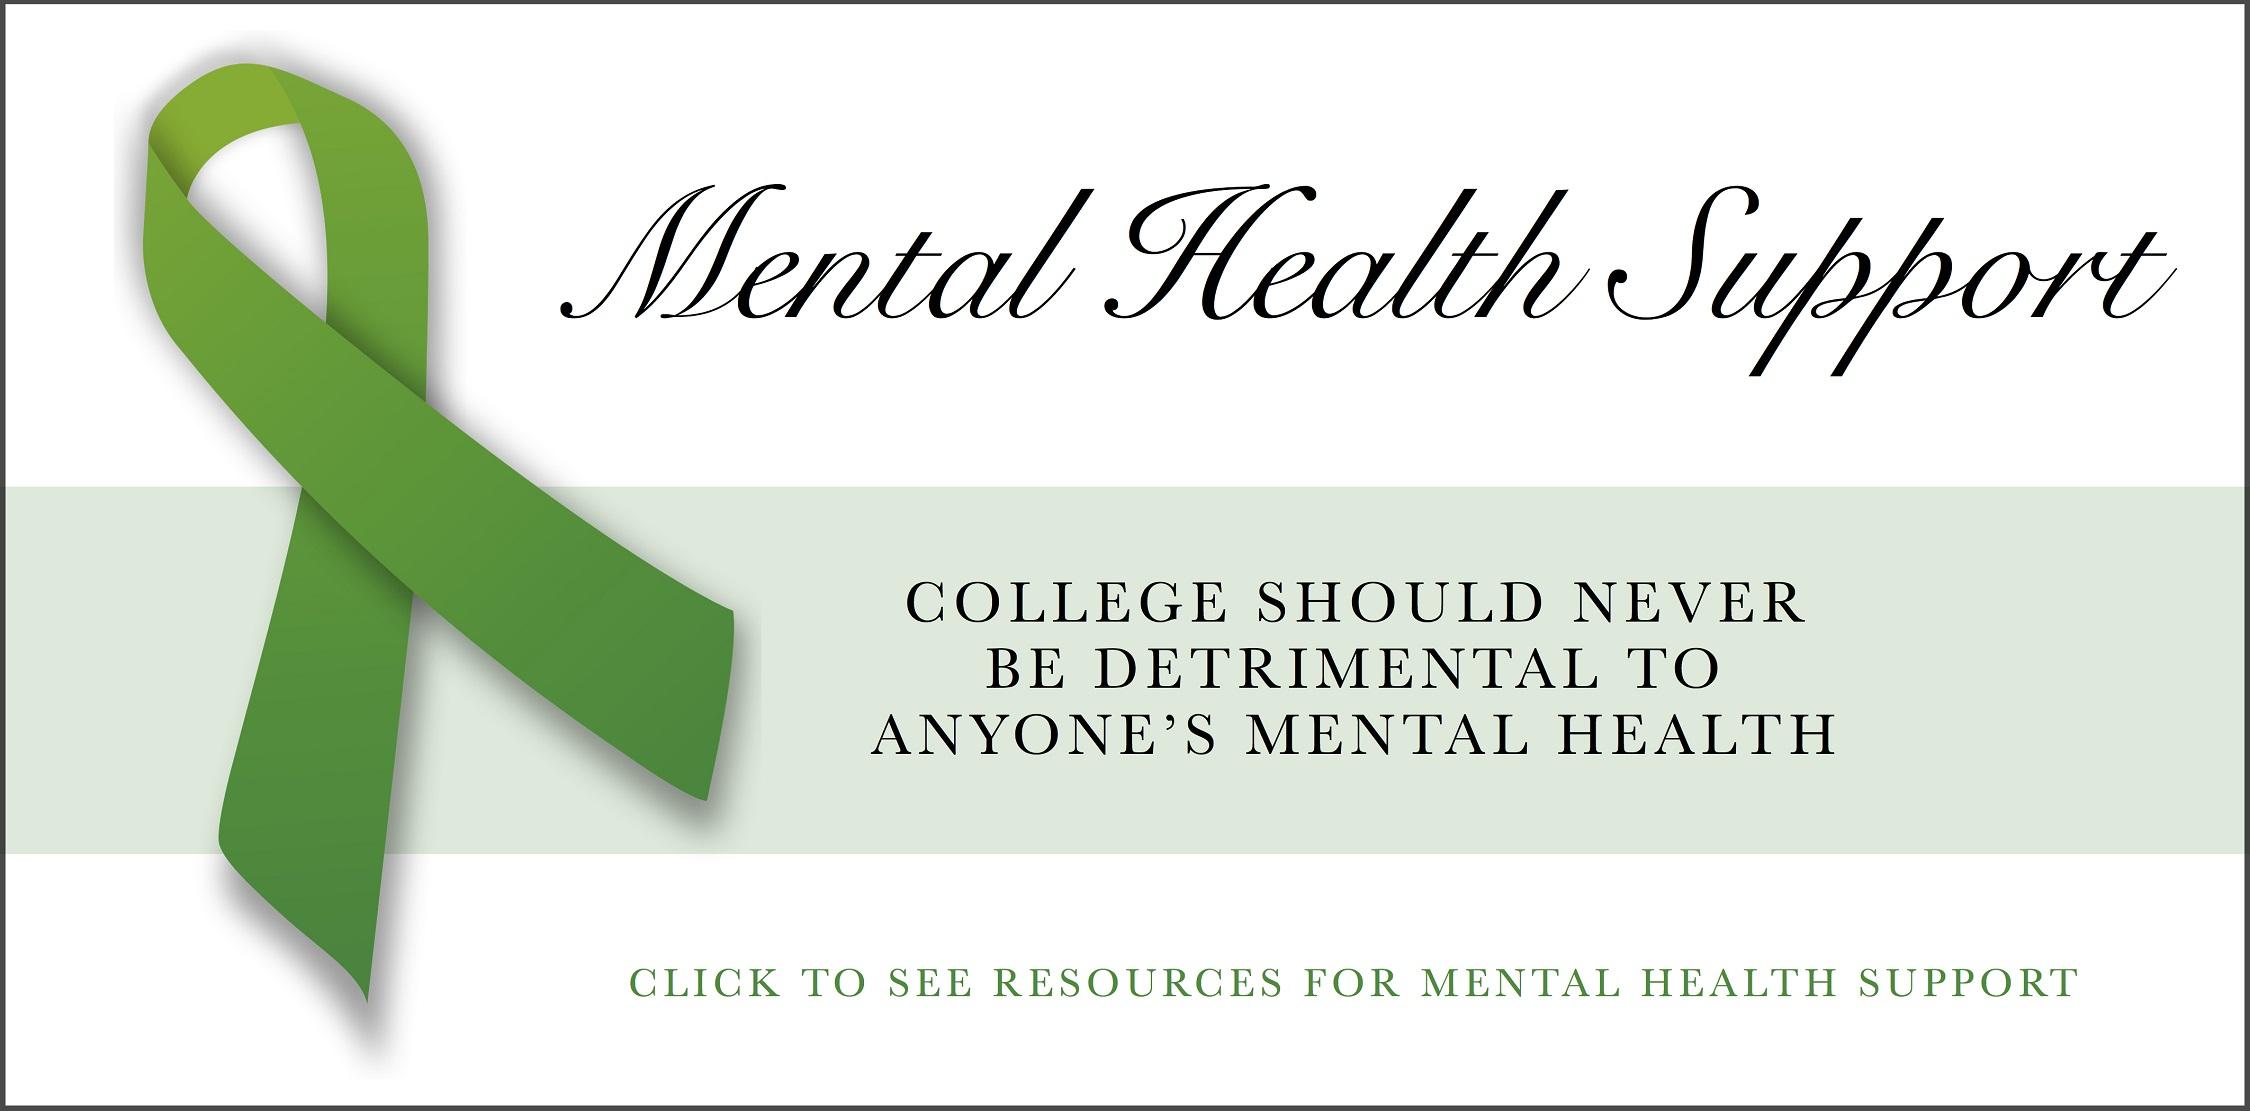 Mental Health Support Western Kentucky University